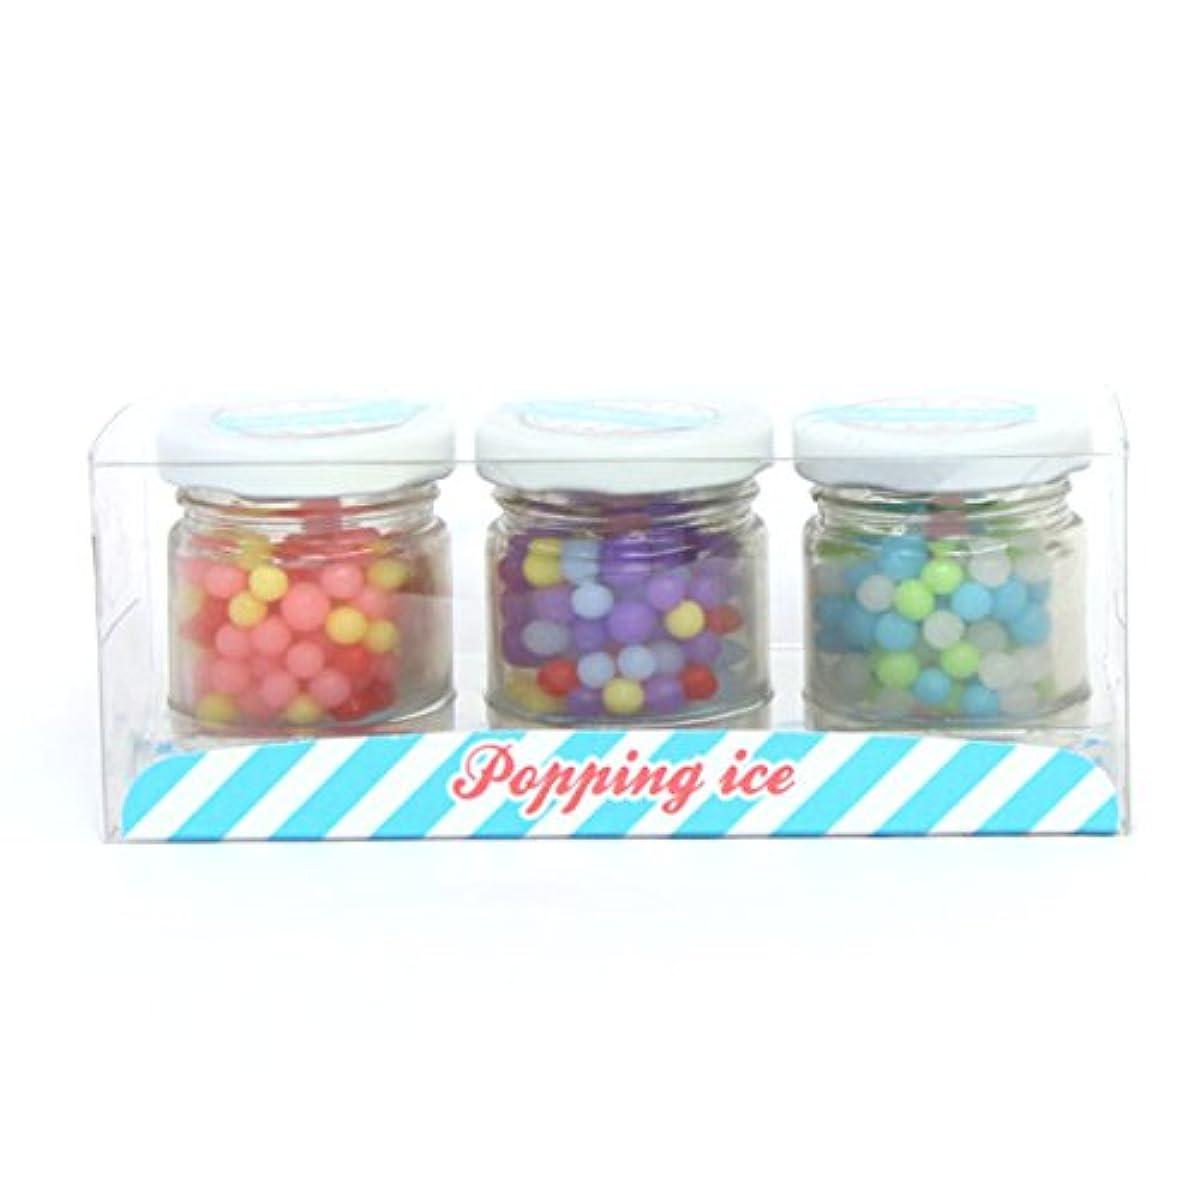 sweets candle(スイーツキャンドル) 【OUTLET】【アウトレット】つぶつぶアイス キャンドル 145×55×58 (outa3050000)